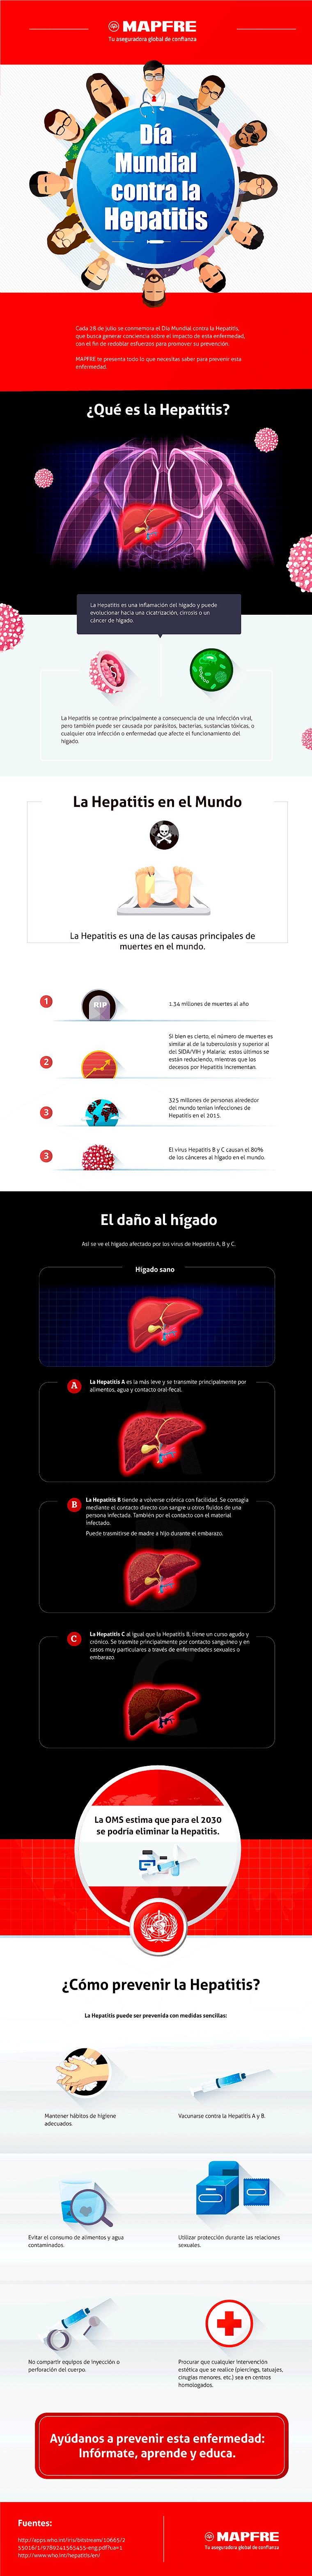 Infografia-Dia-Mundial-contra-la-Hepatitis